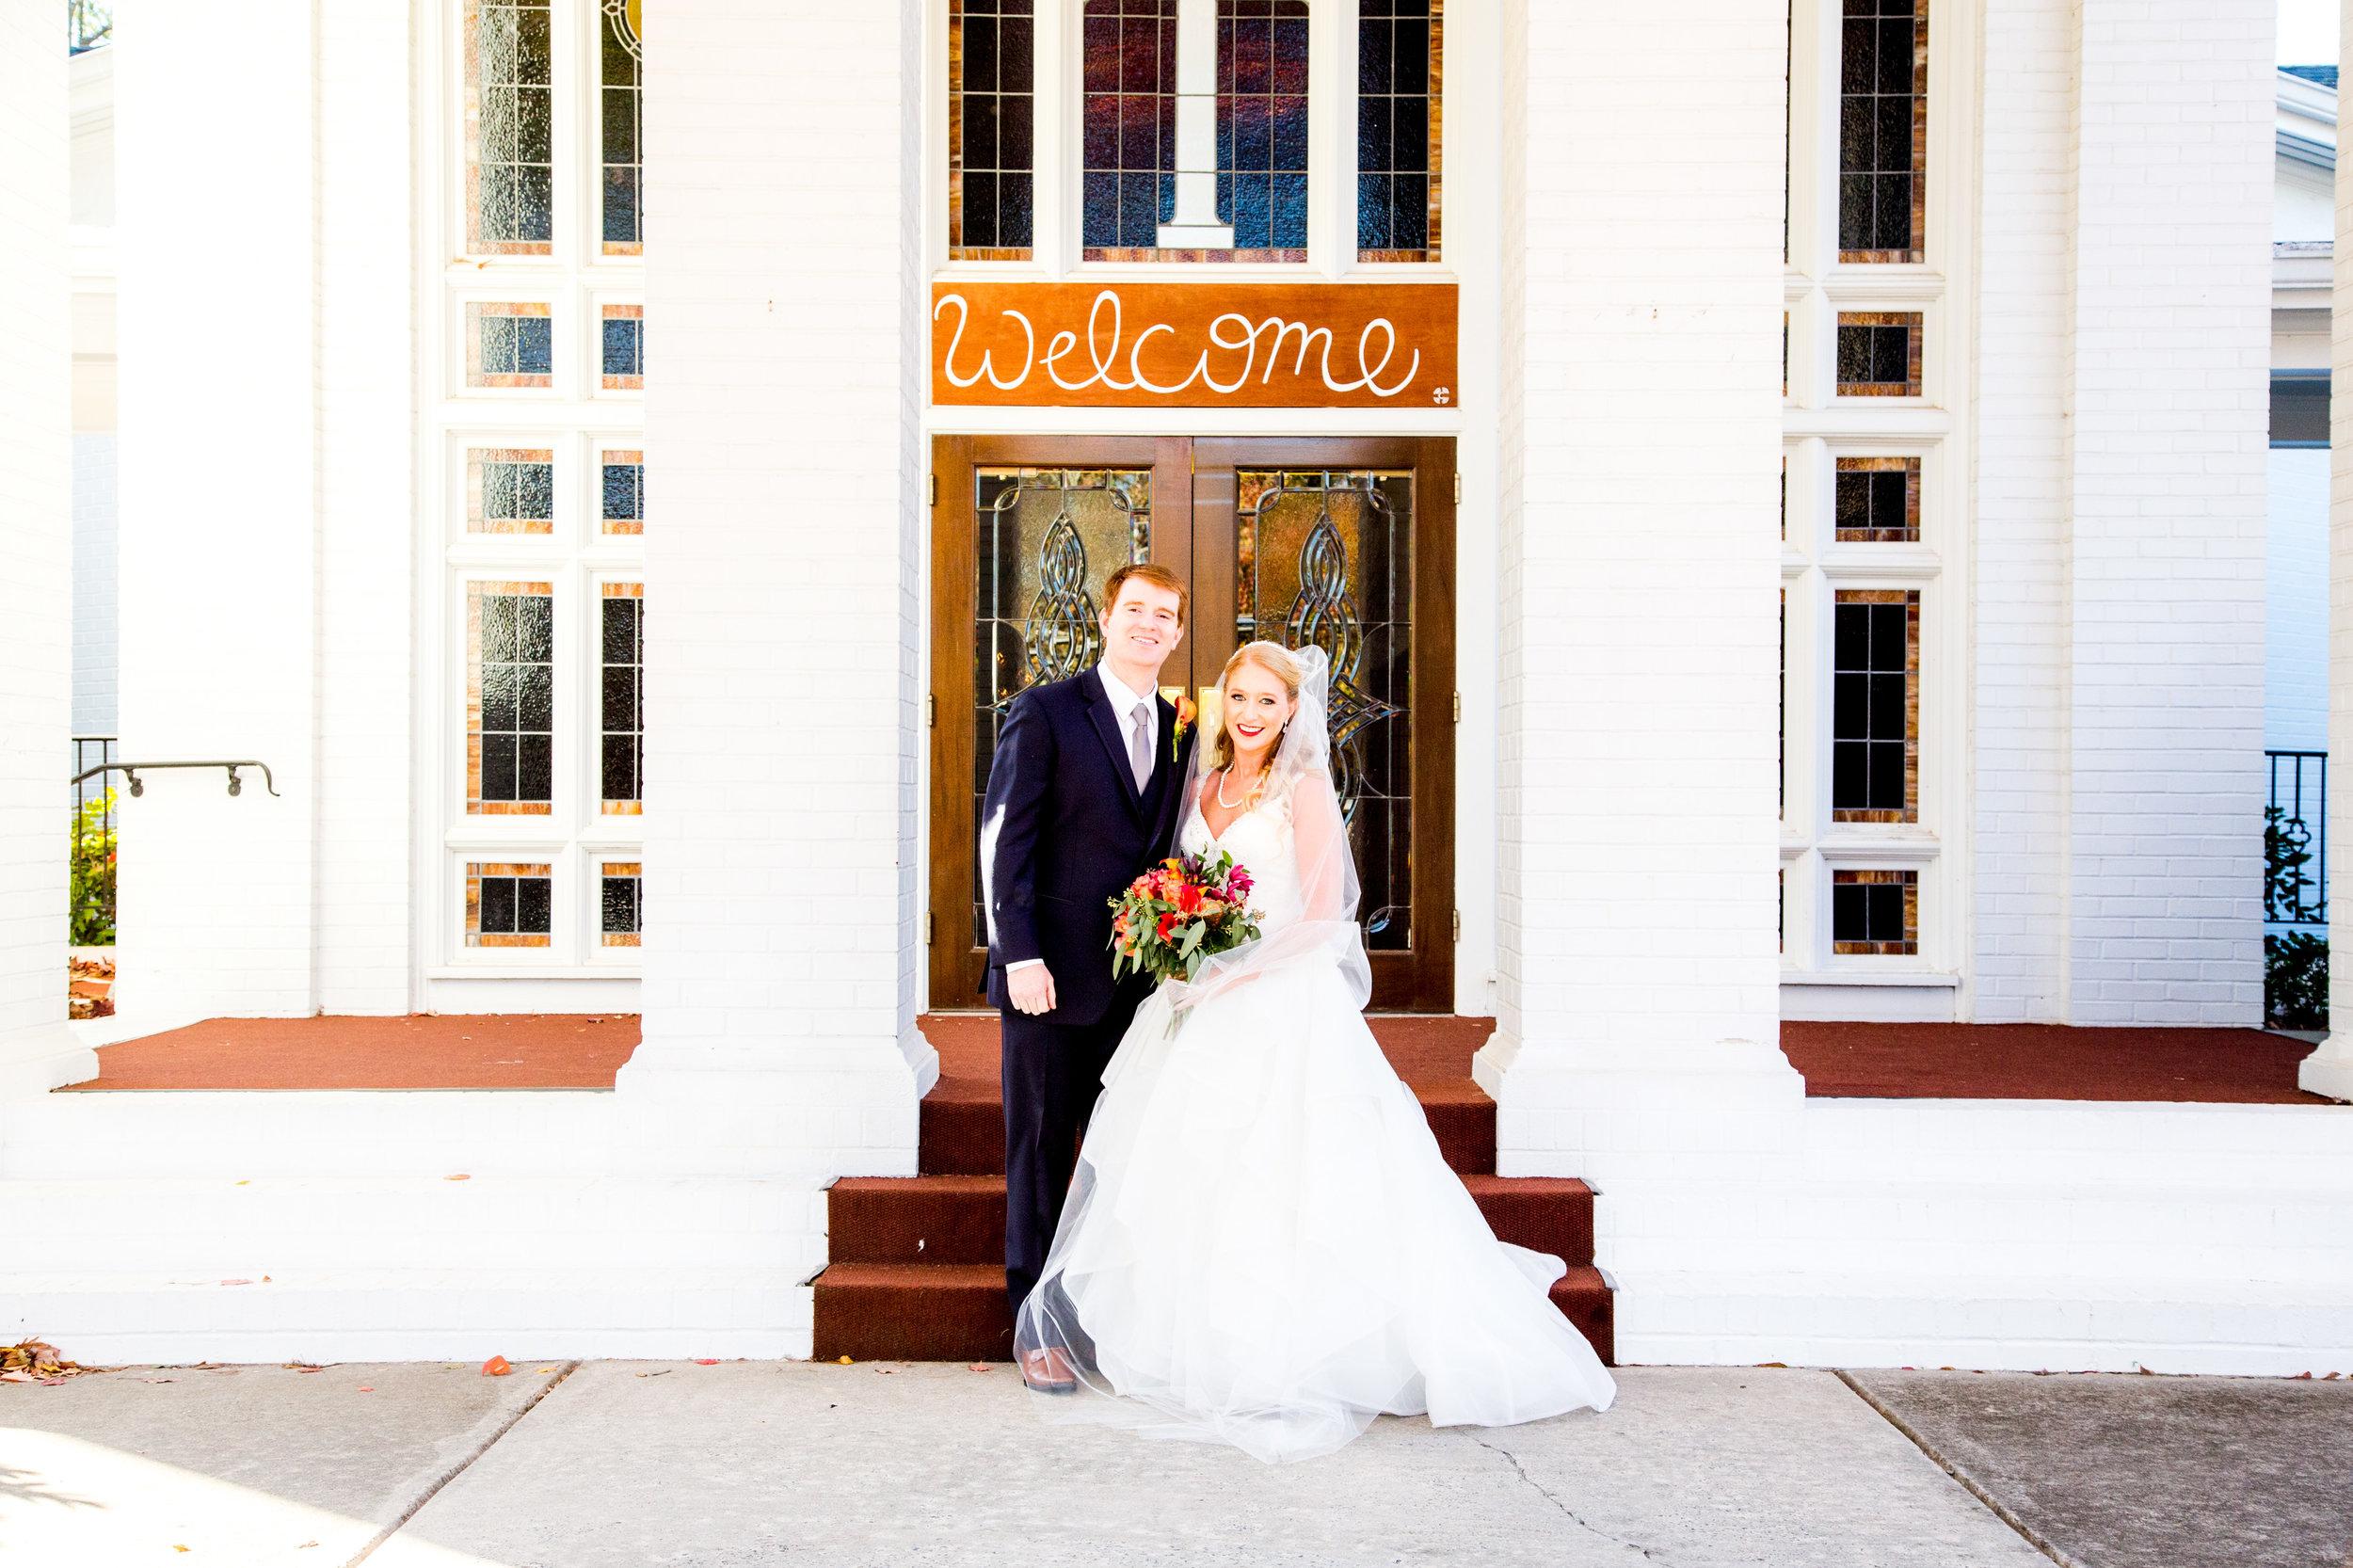 Andrew&Emma_Wedding-456.jpg